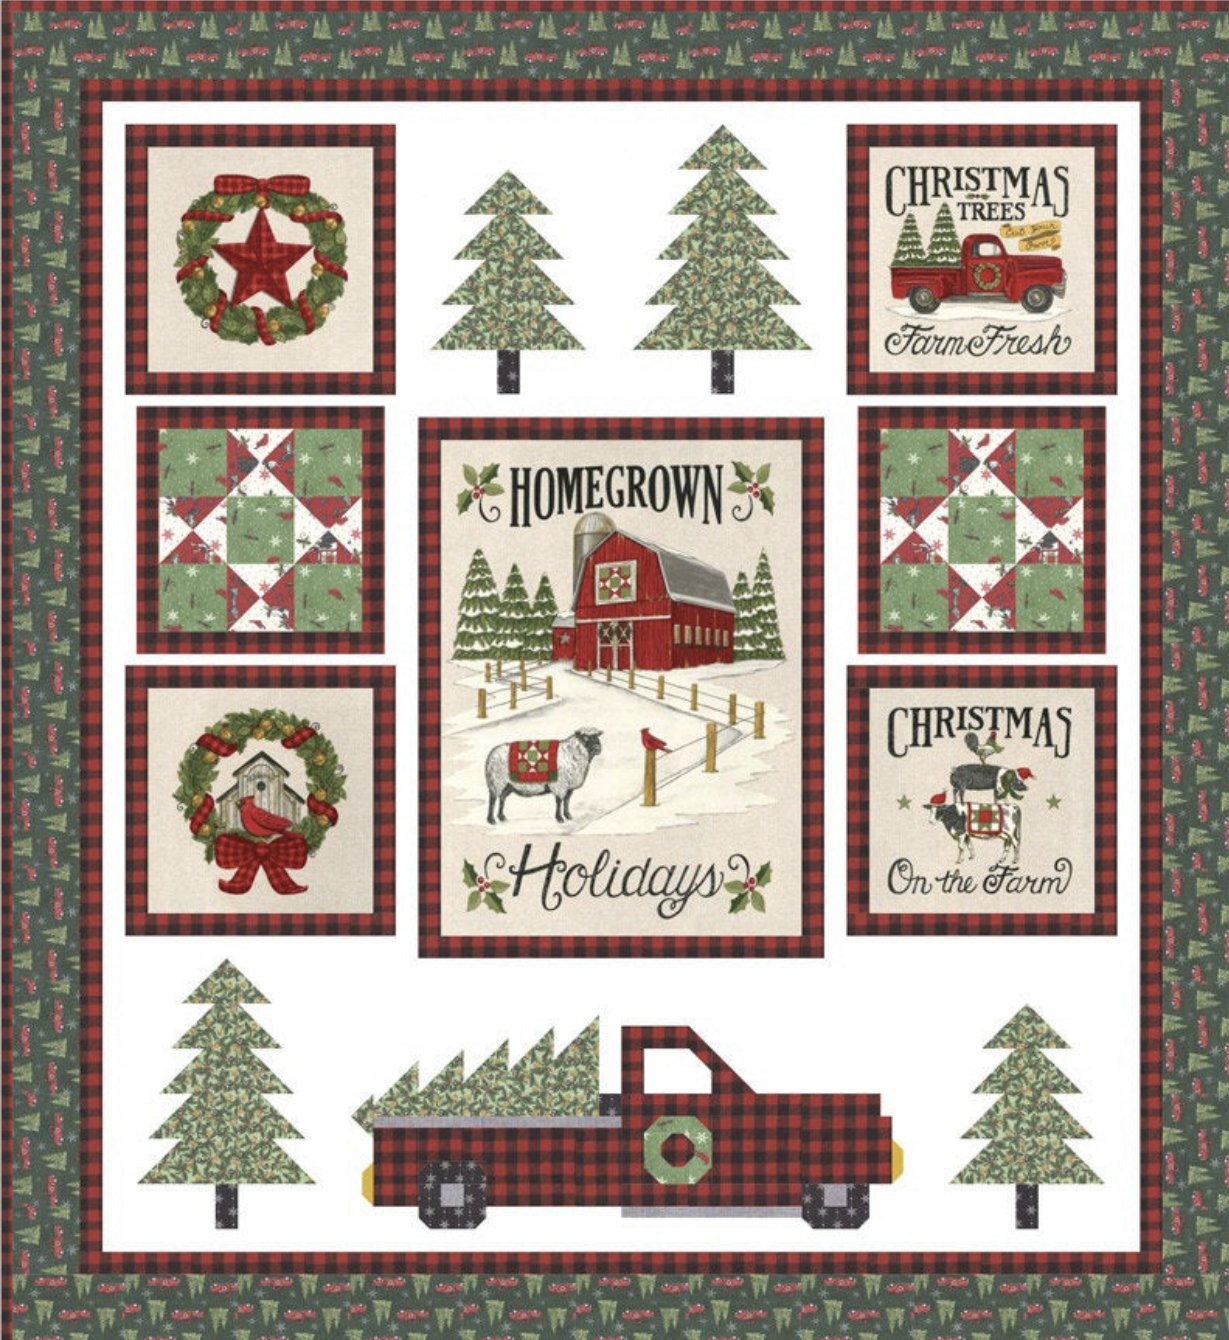 Homegrown Holidays by Deb Strain for Moda Fabrics 54x58